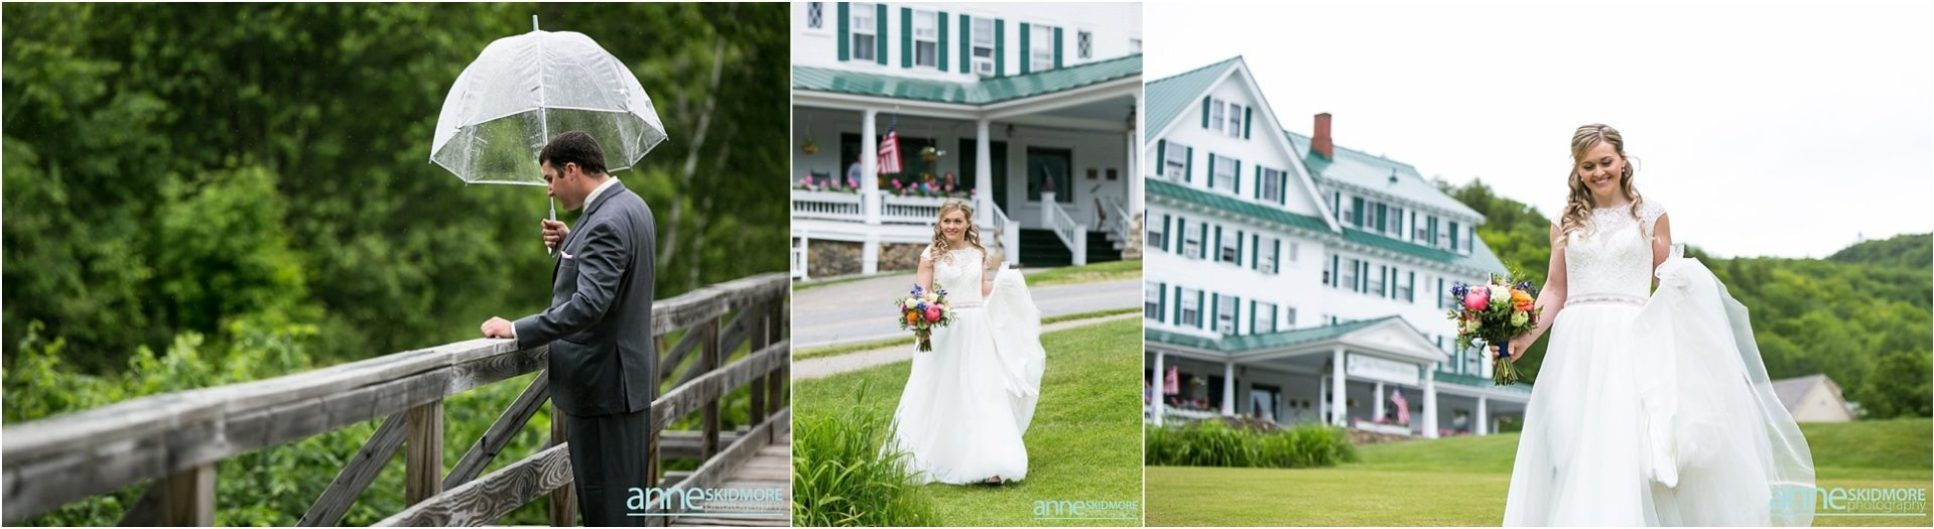 Eagle_Mountain_House_Wedding__018